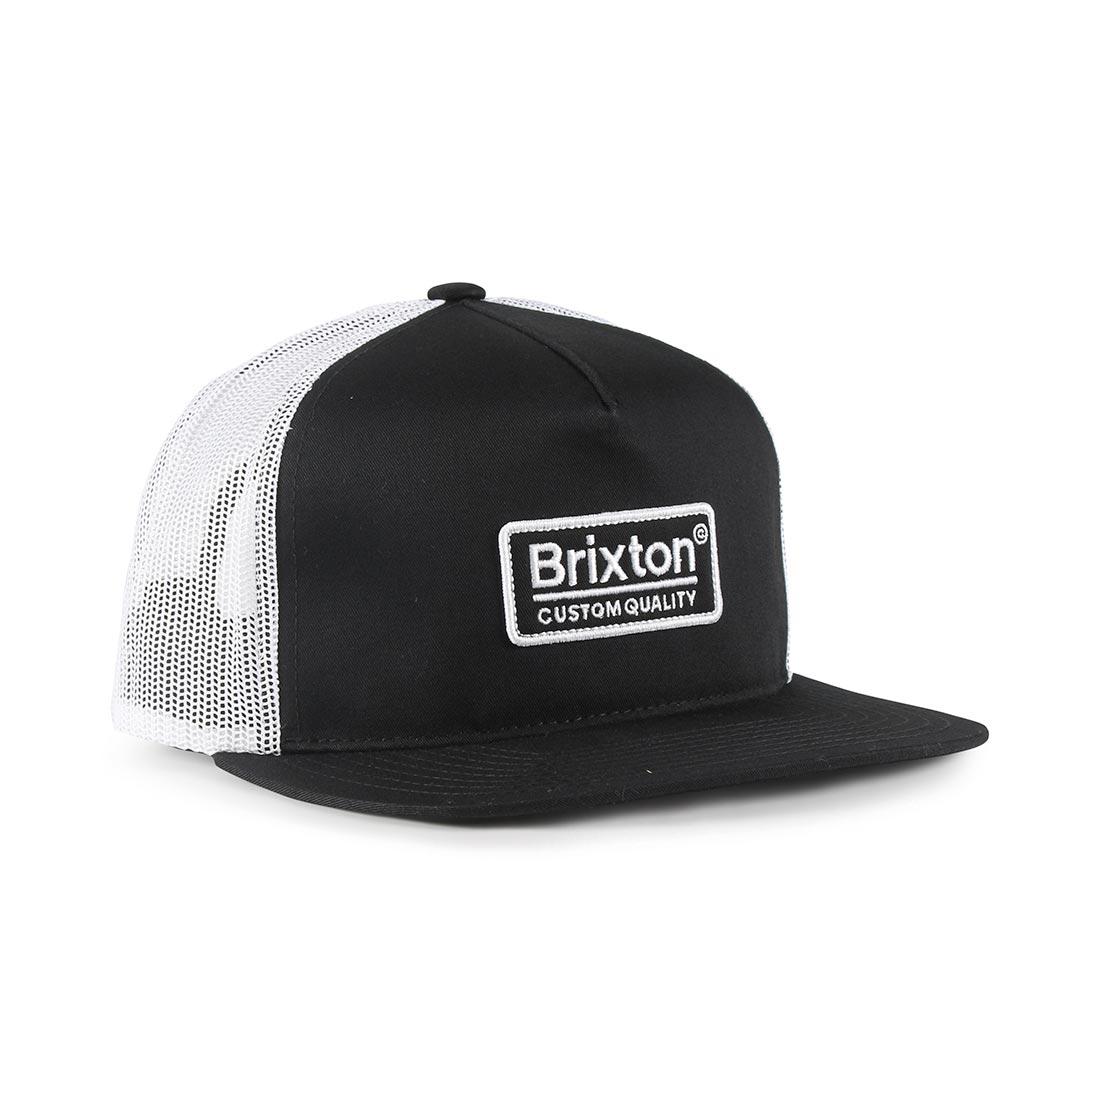 ... Brixton-Palmer-Mesh-Back-Cap-Black-White- ... 3c81ee8c0168